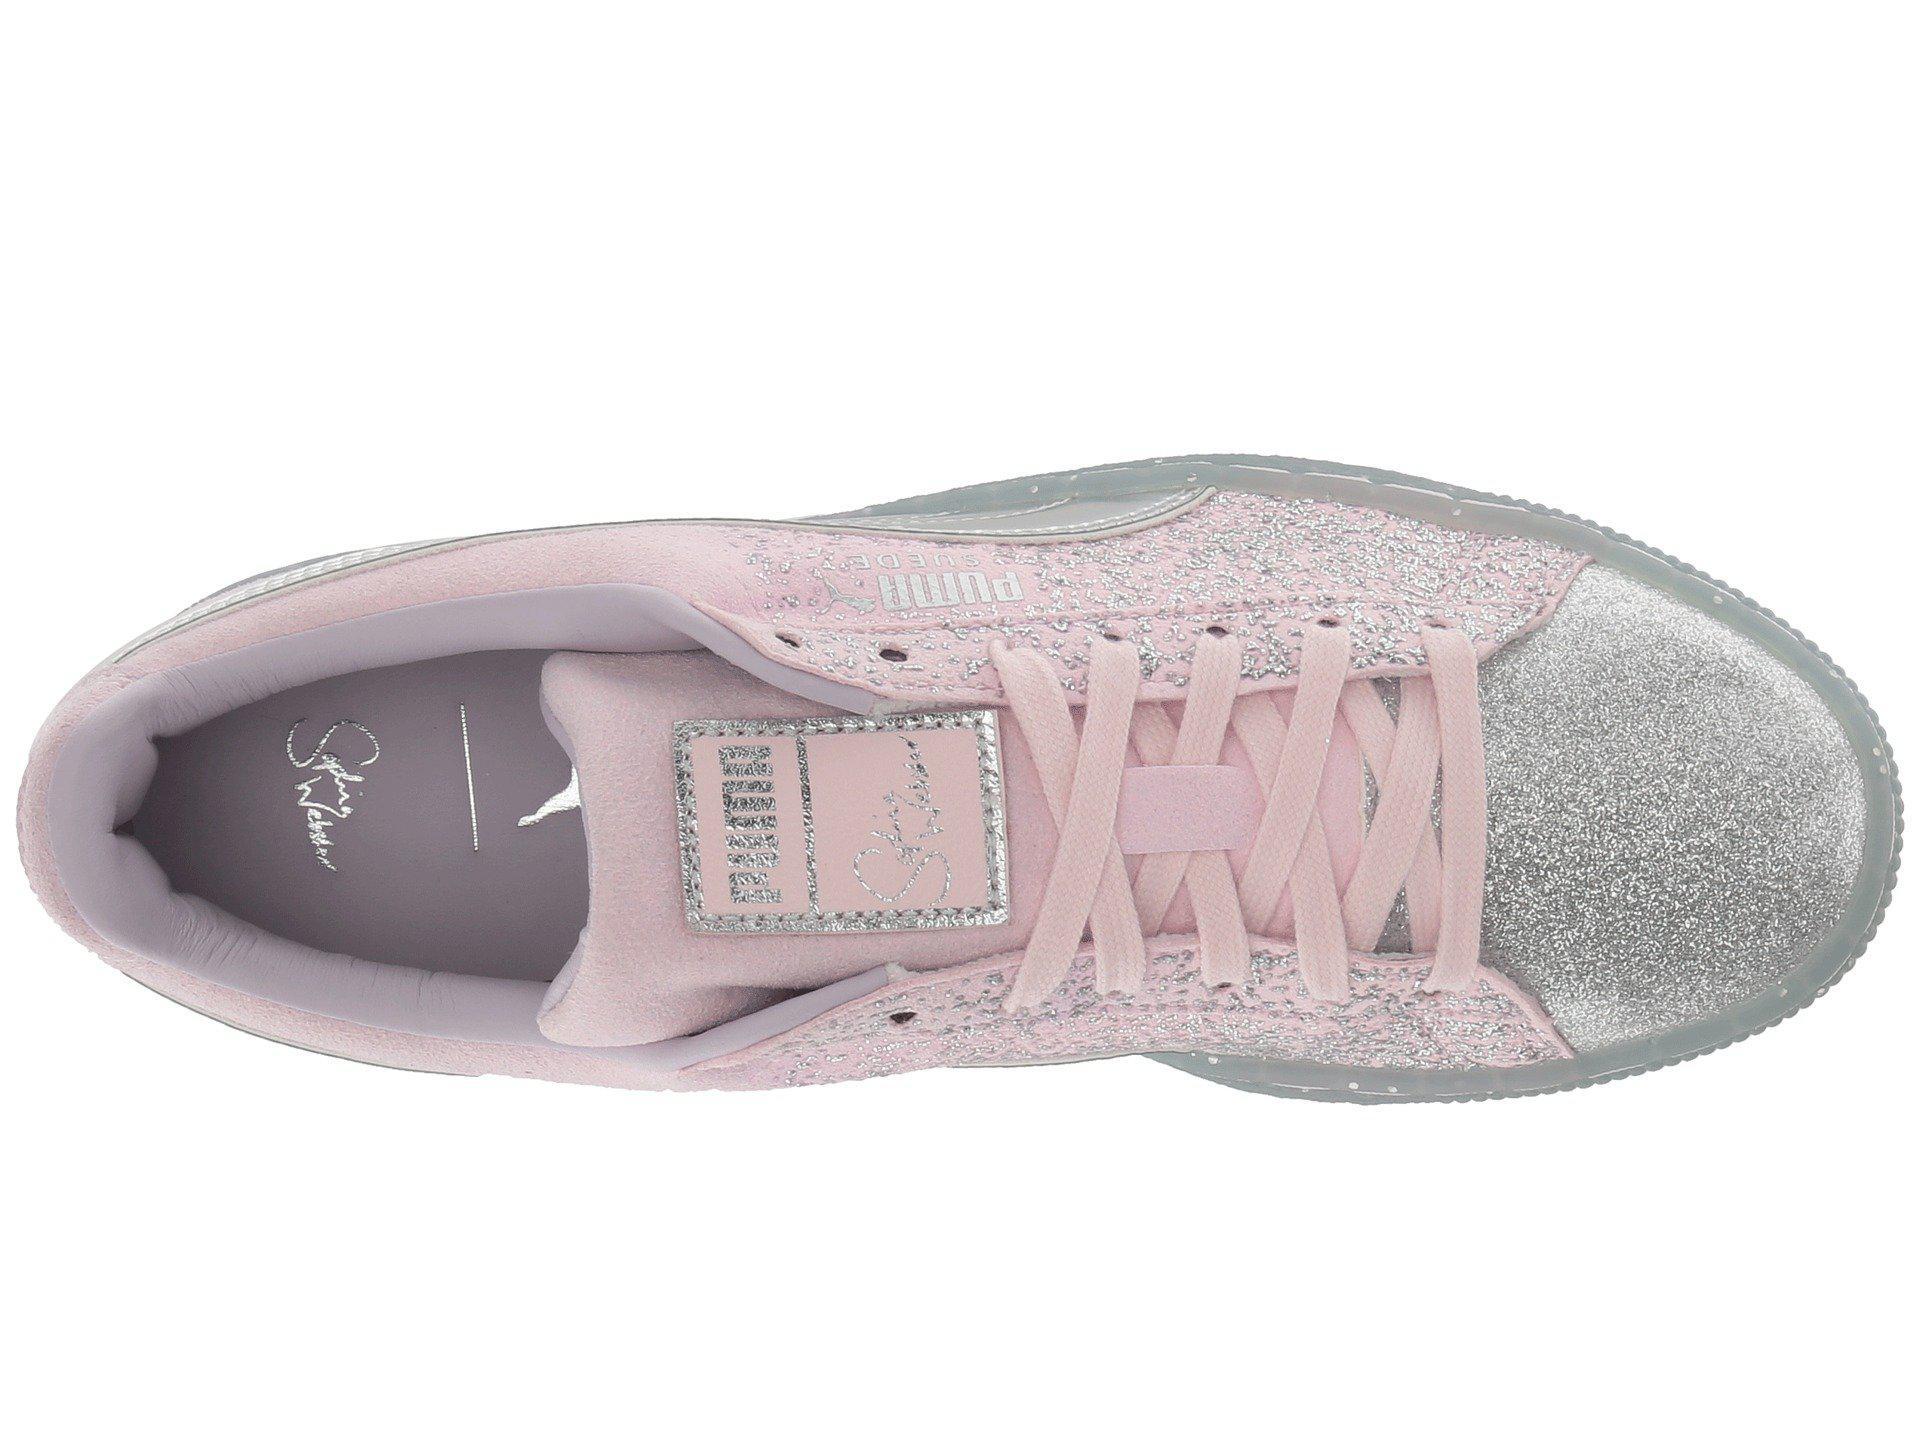 6c03ca2ab7e346 Lyst - PUMA X Sophia Webster Suede Glitter Princess Sneaker (orchid ...